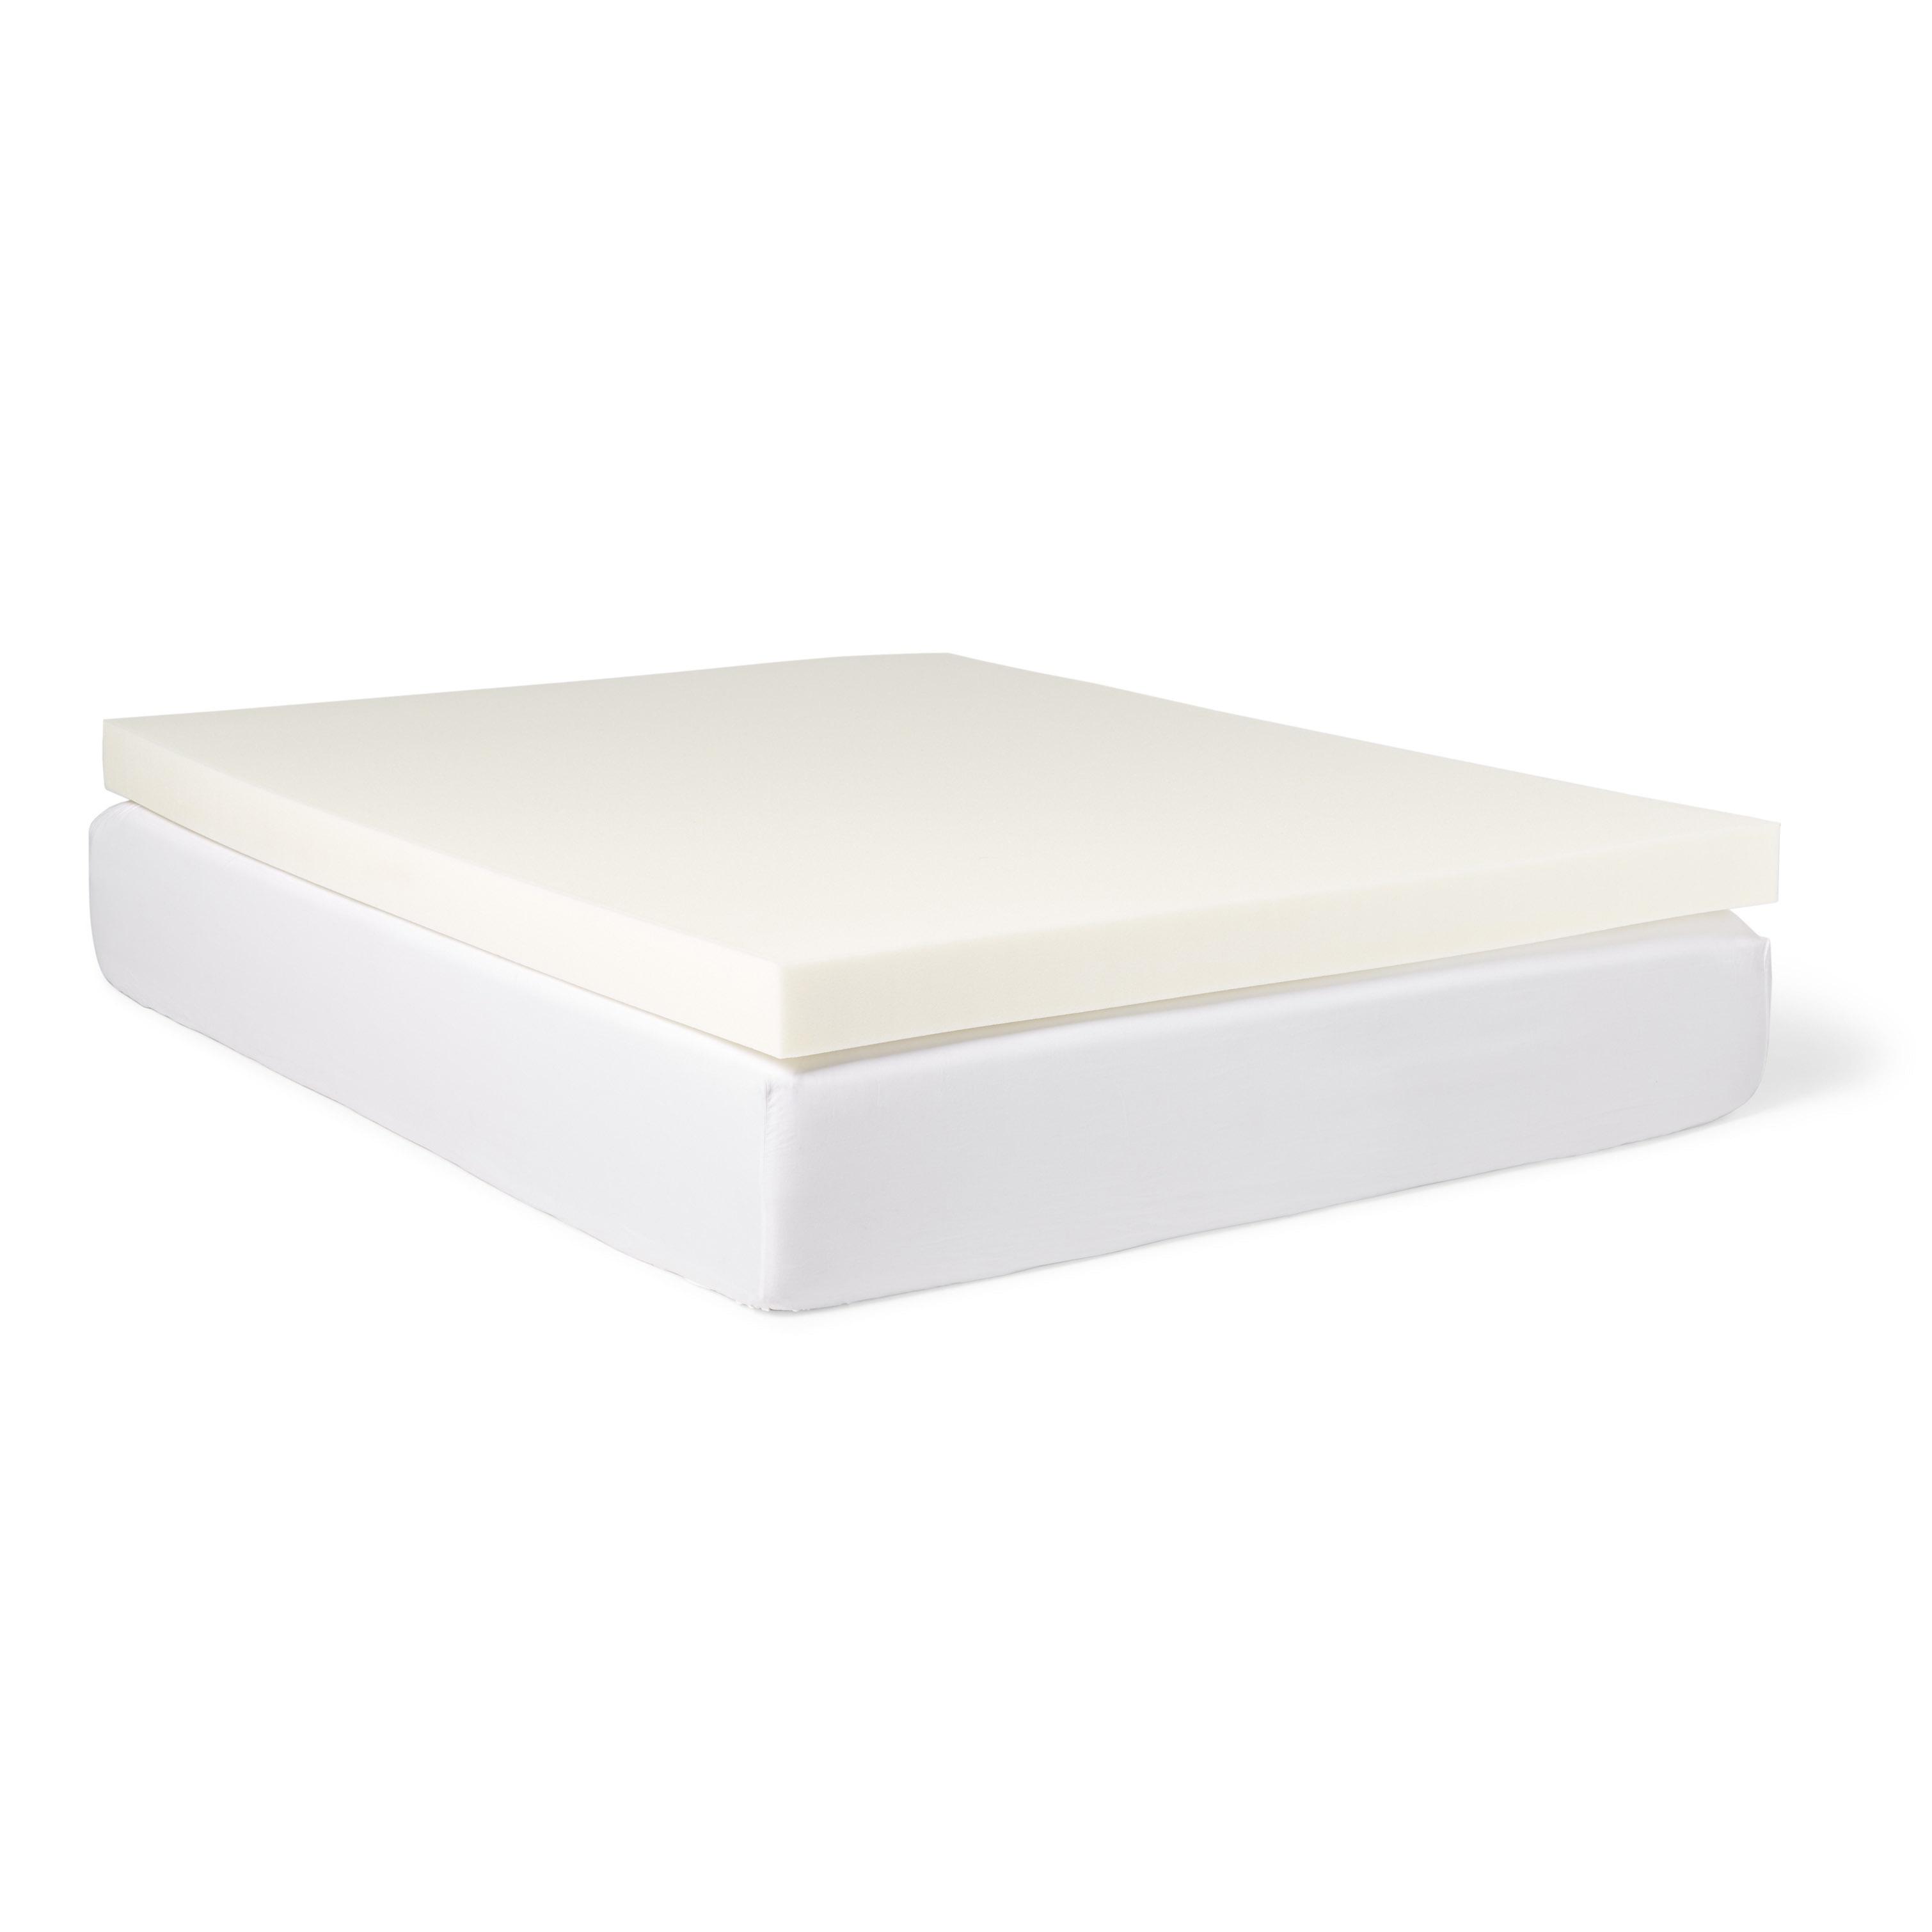 Slumber Pet 4-inch Memory Foam Mattress Topper with Water...